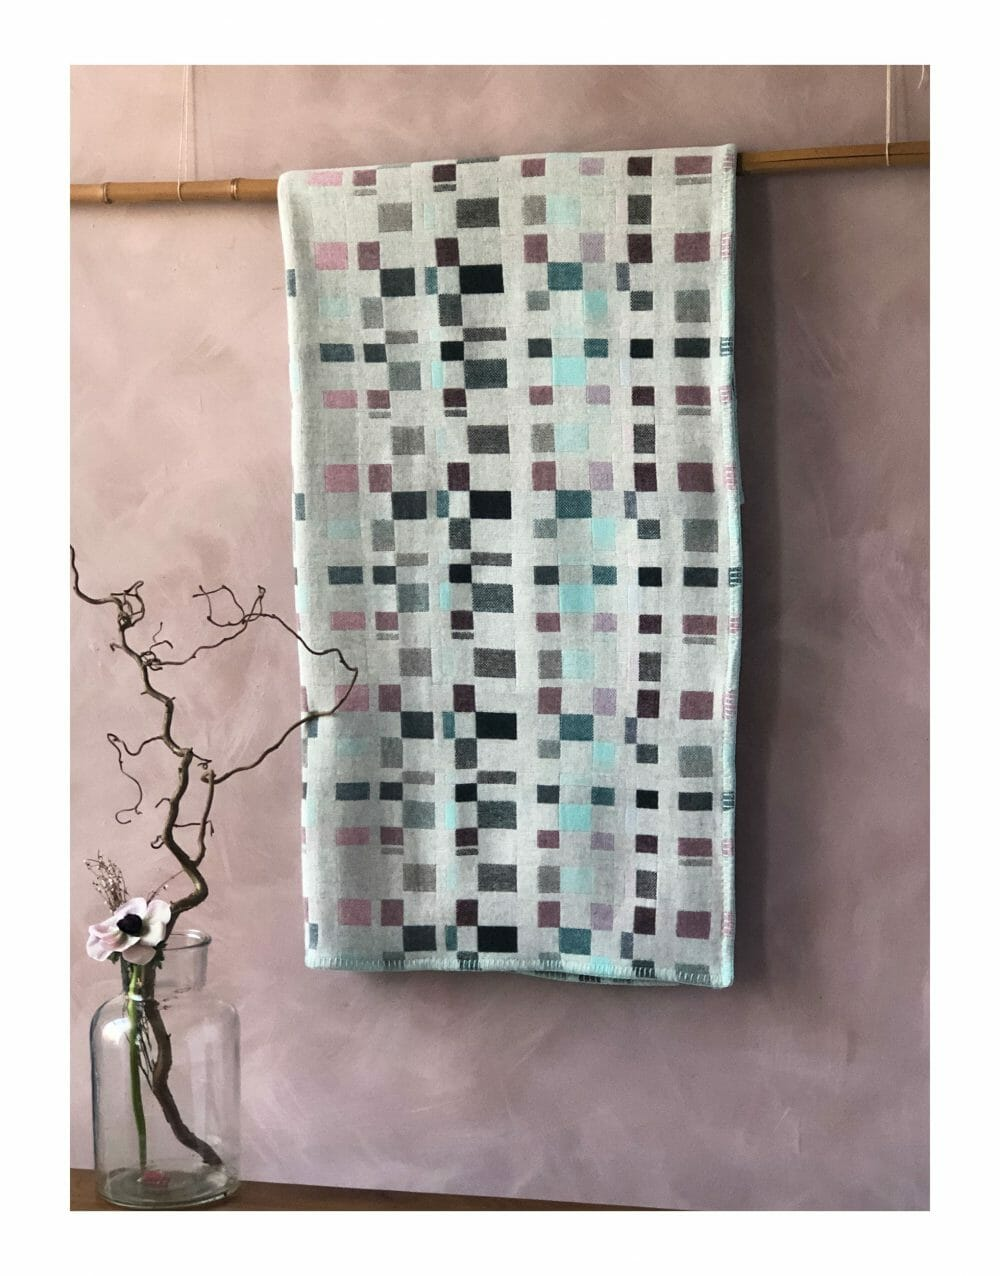 macaron-sorbet-blanket-textiles-patterns-throw-design-fabric-homeware